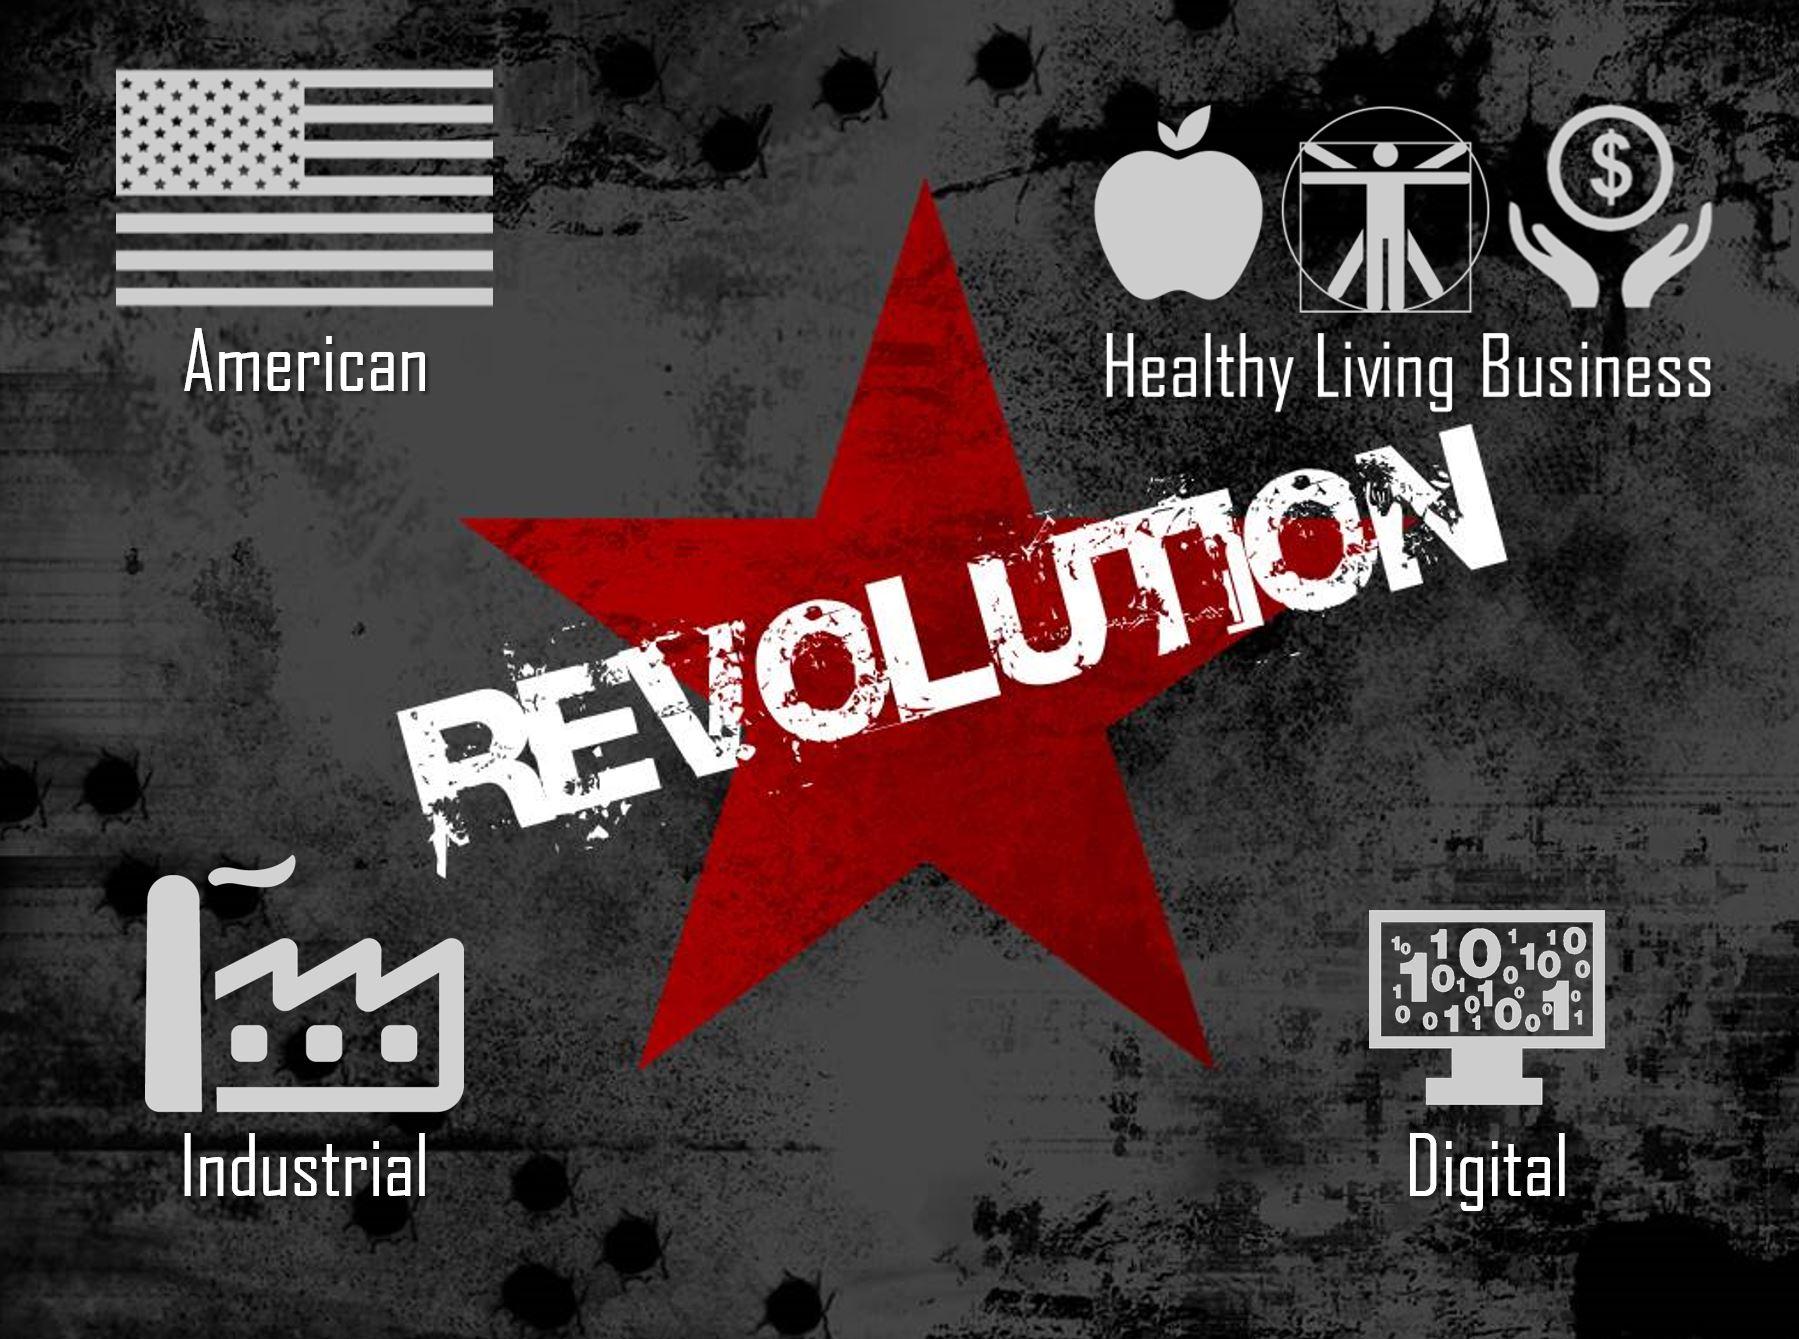 HLB revolution.JPG